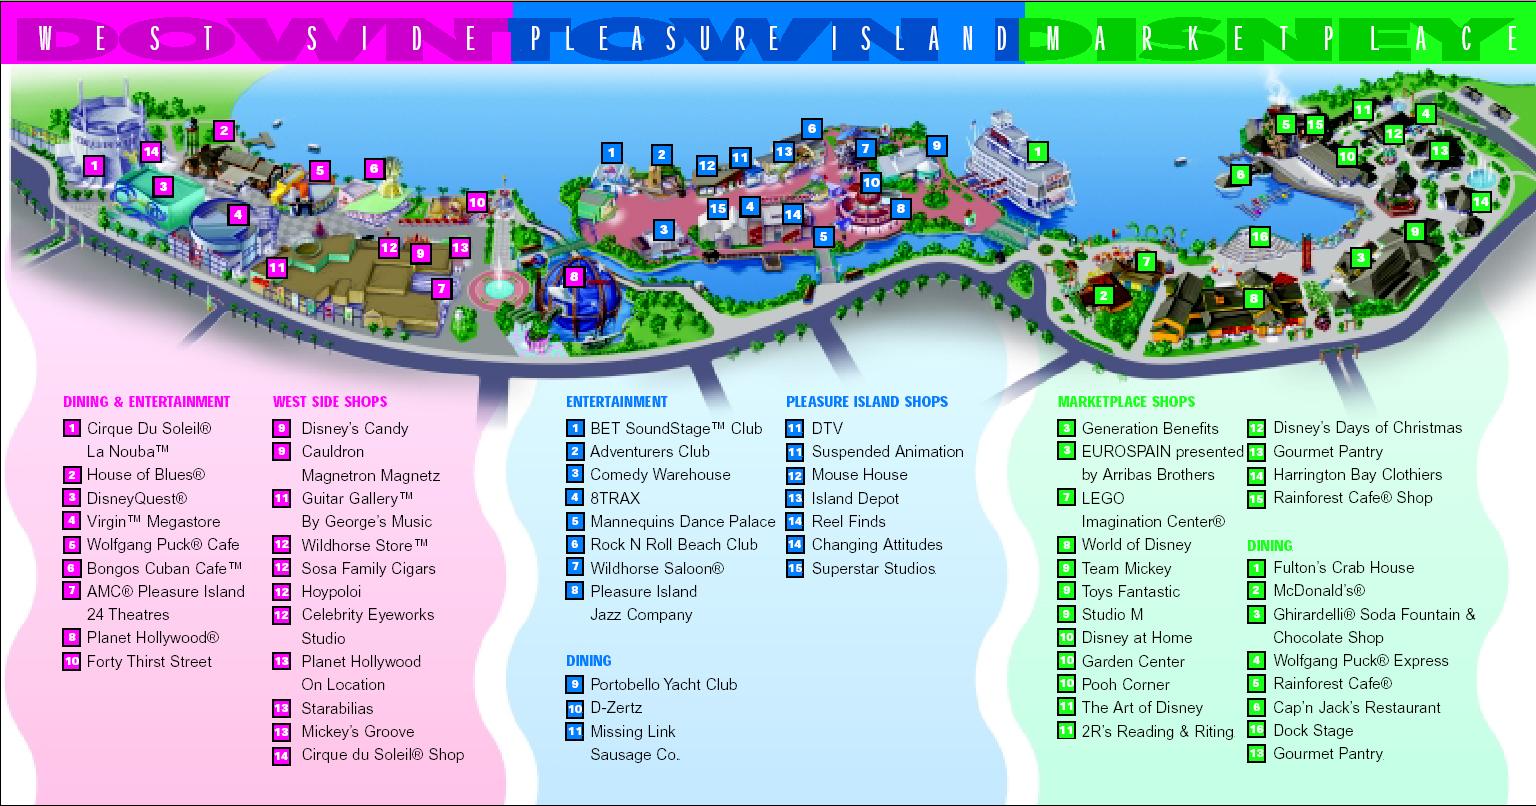 Downtown Disney Map Image   Disney world downtown disney map. | The KingdomKeepers  Downtown Disney Map